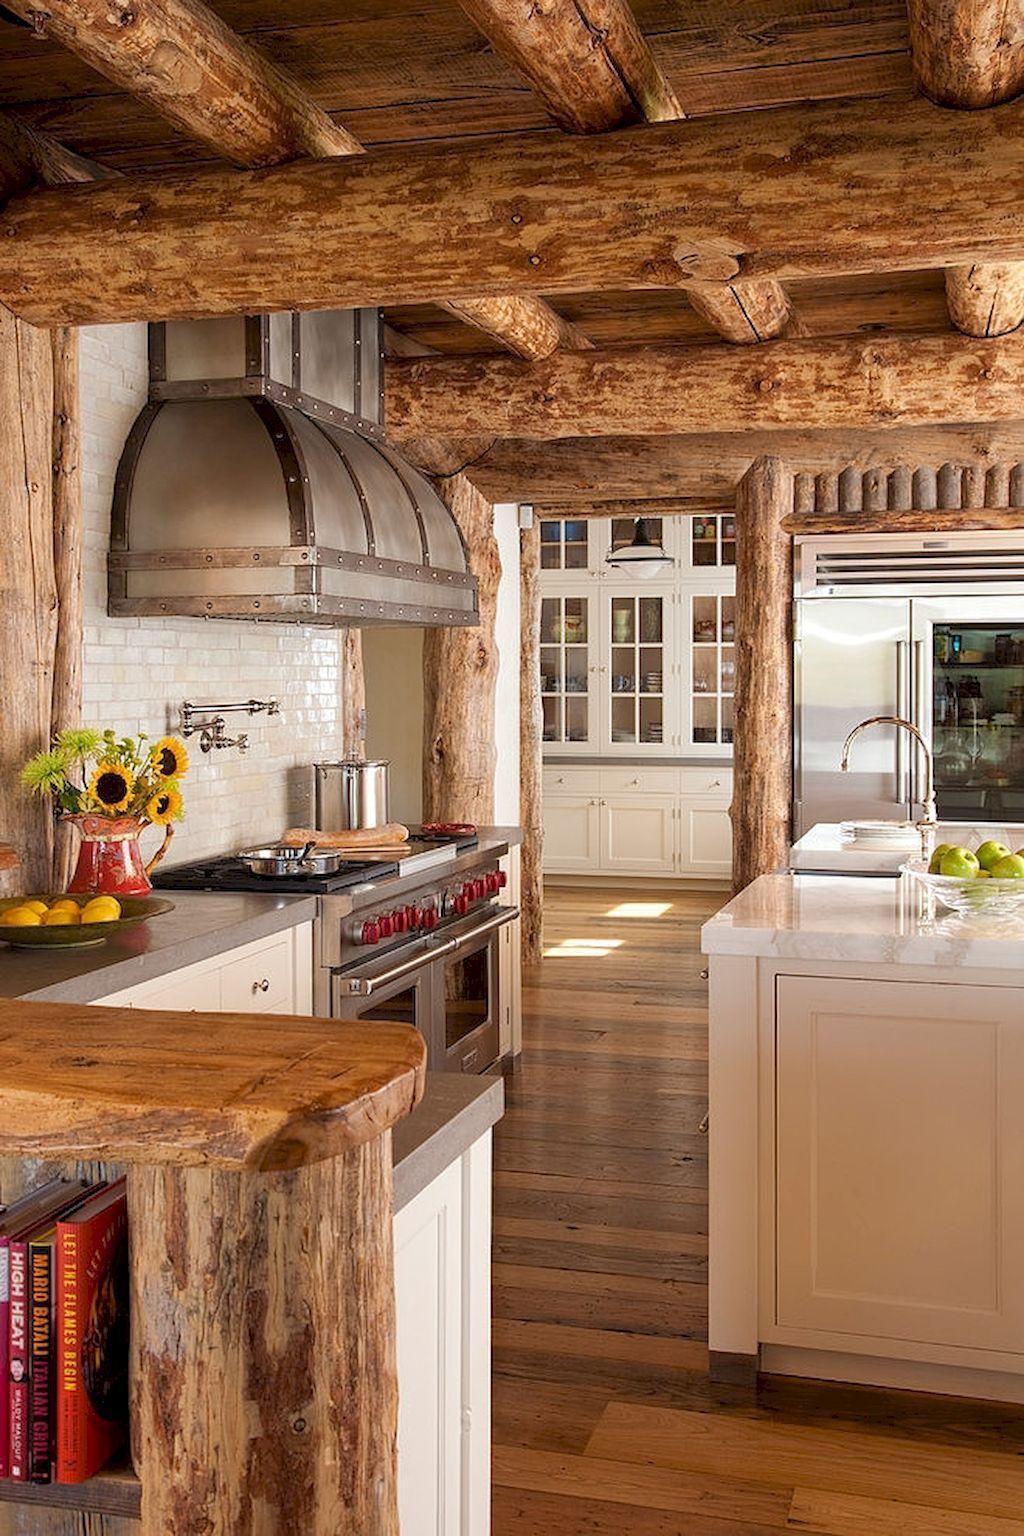 120 modern rustic farmhouse kitchen decor ideas 62 log cabin kitchens rustic house rustic on kitchen cabinets rustic farmhouse style id=25387